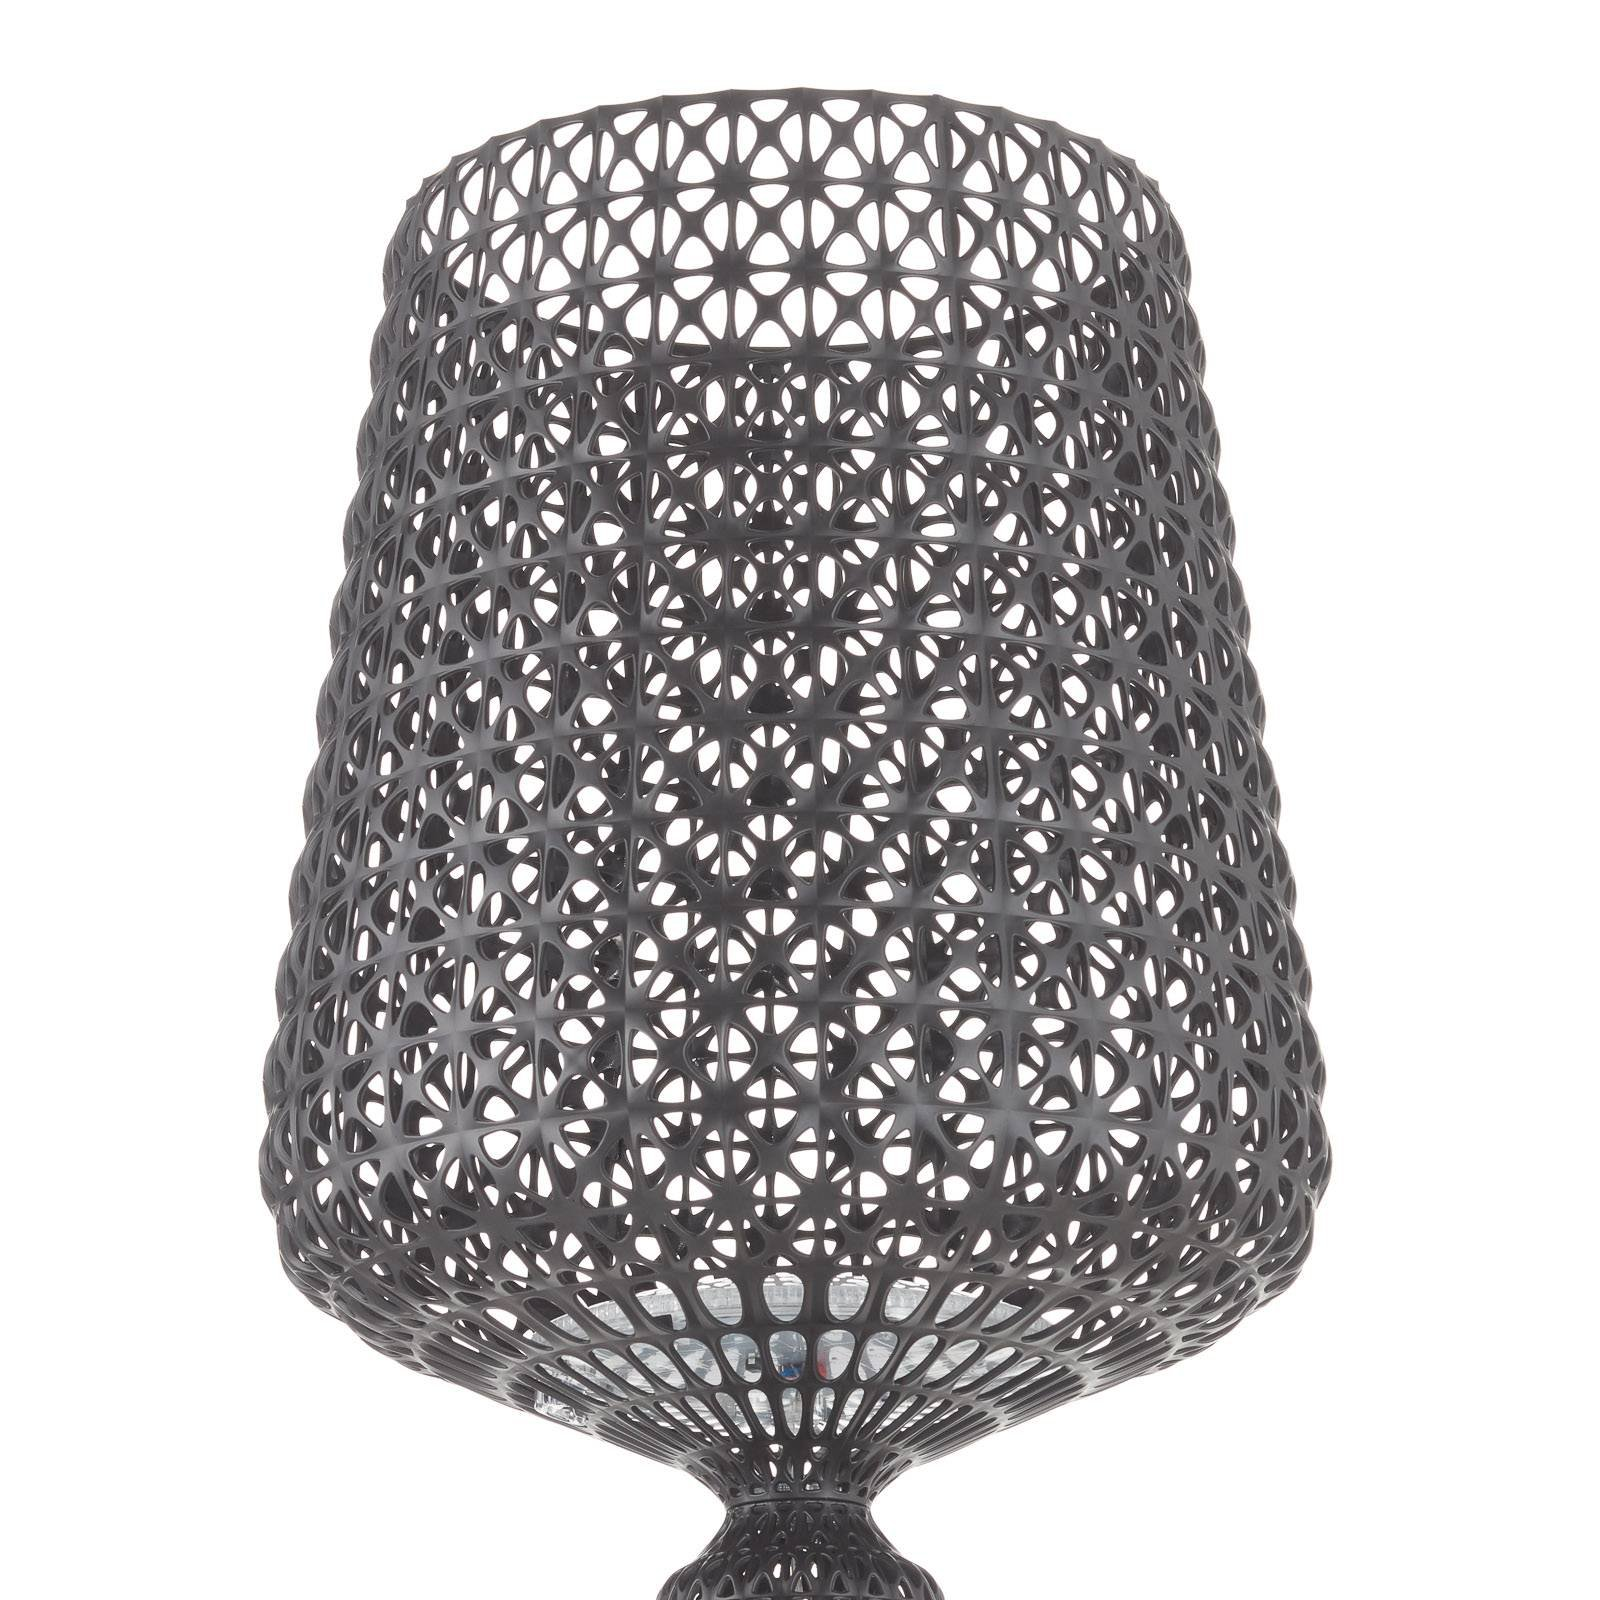 Designer-gulvlampe Kabuki med LED-lys, svart